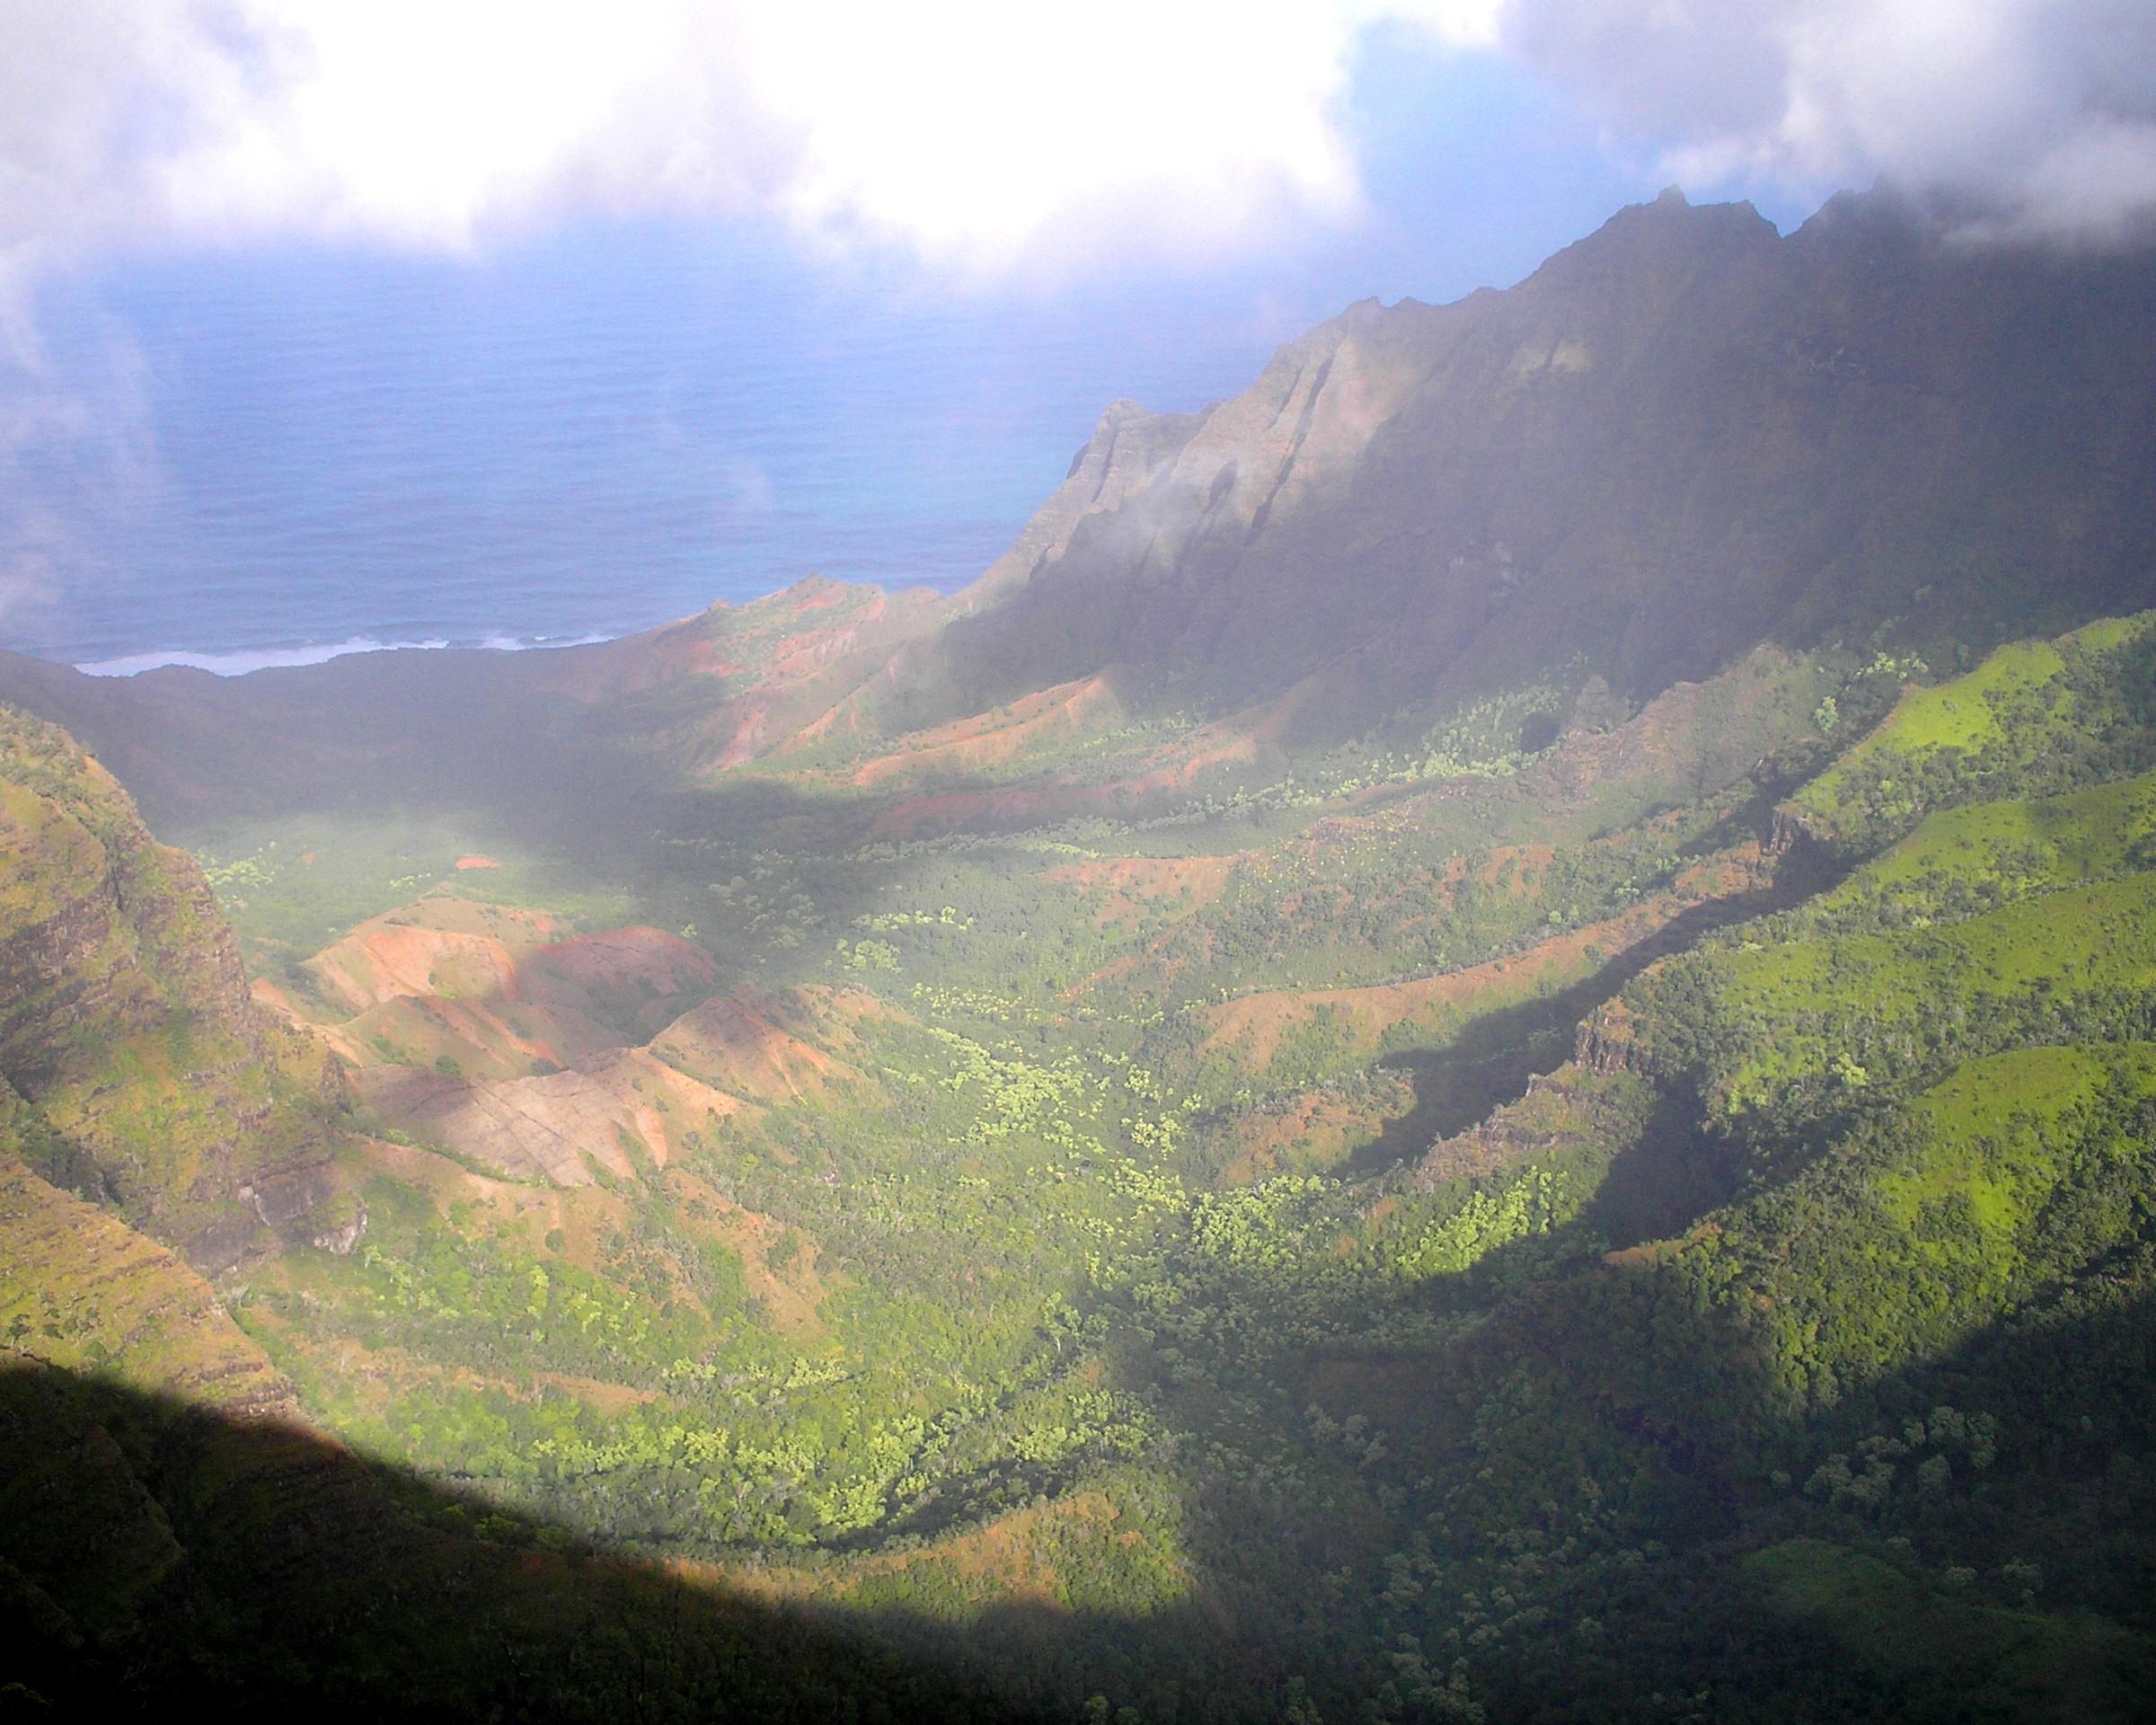 cloudy kalalau valley.JPG